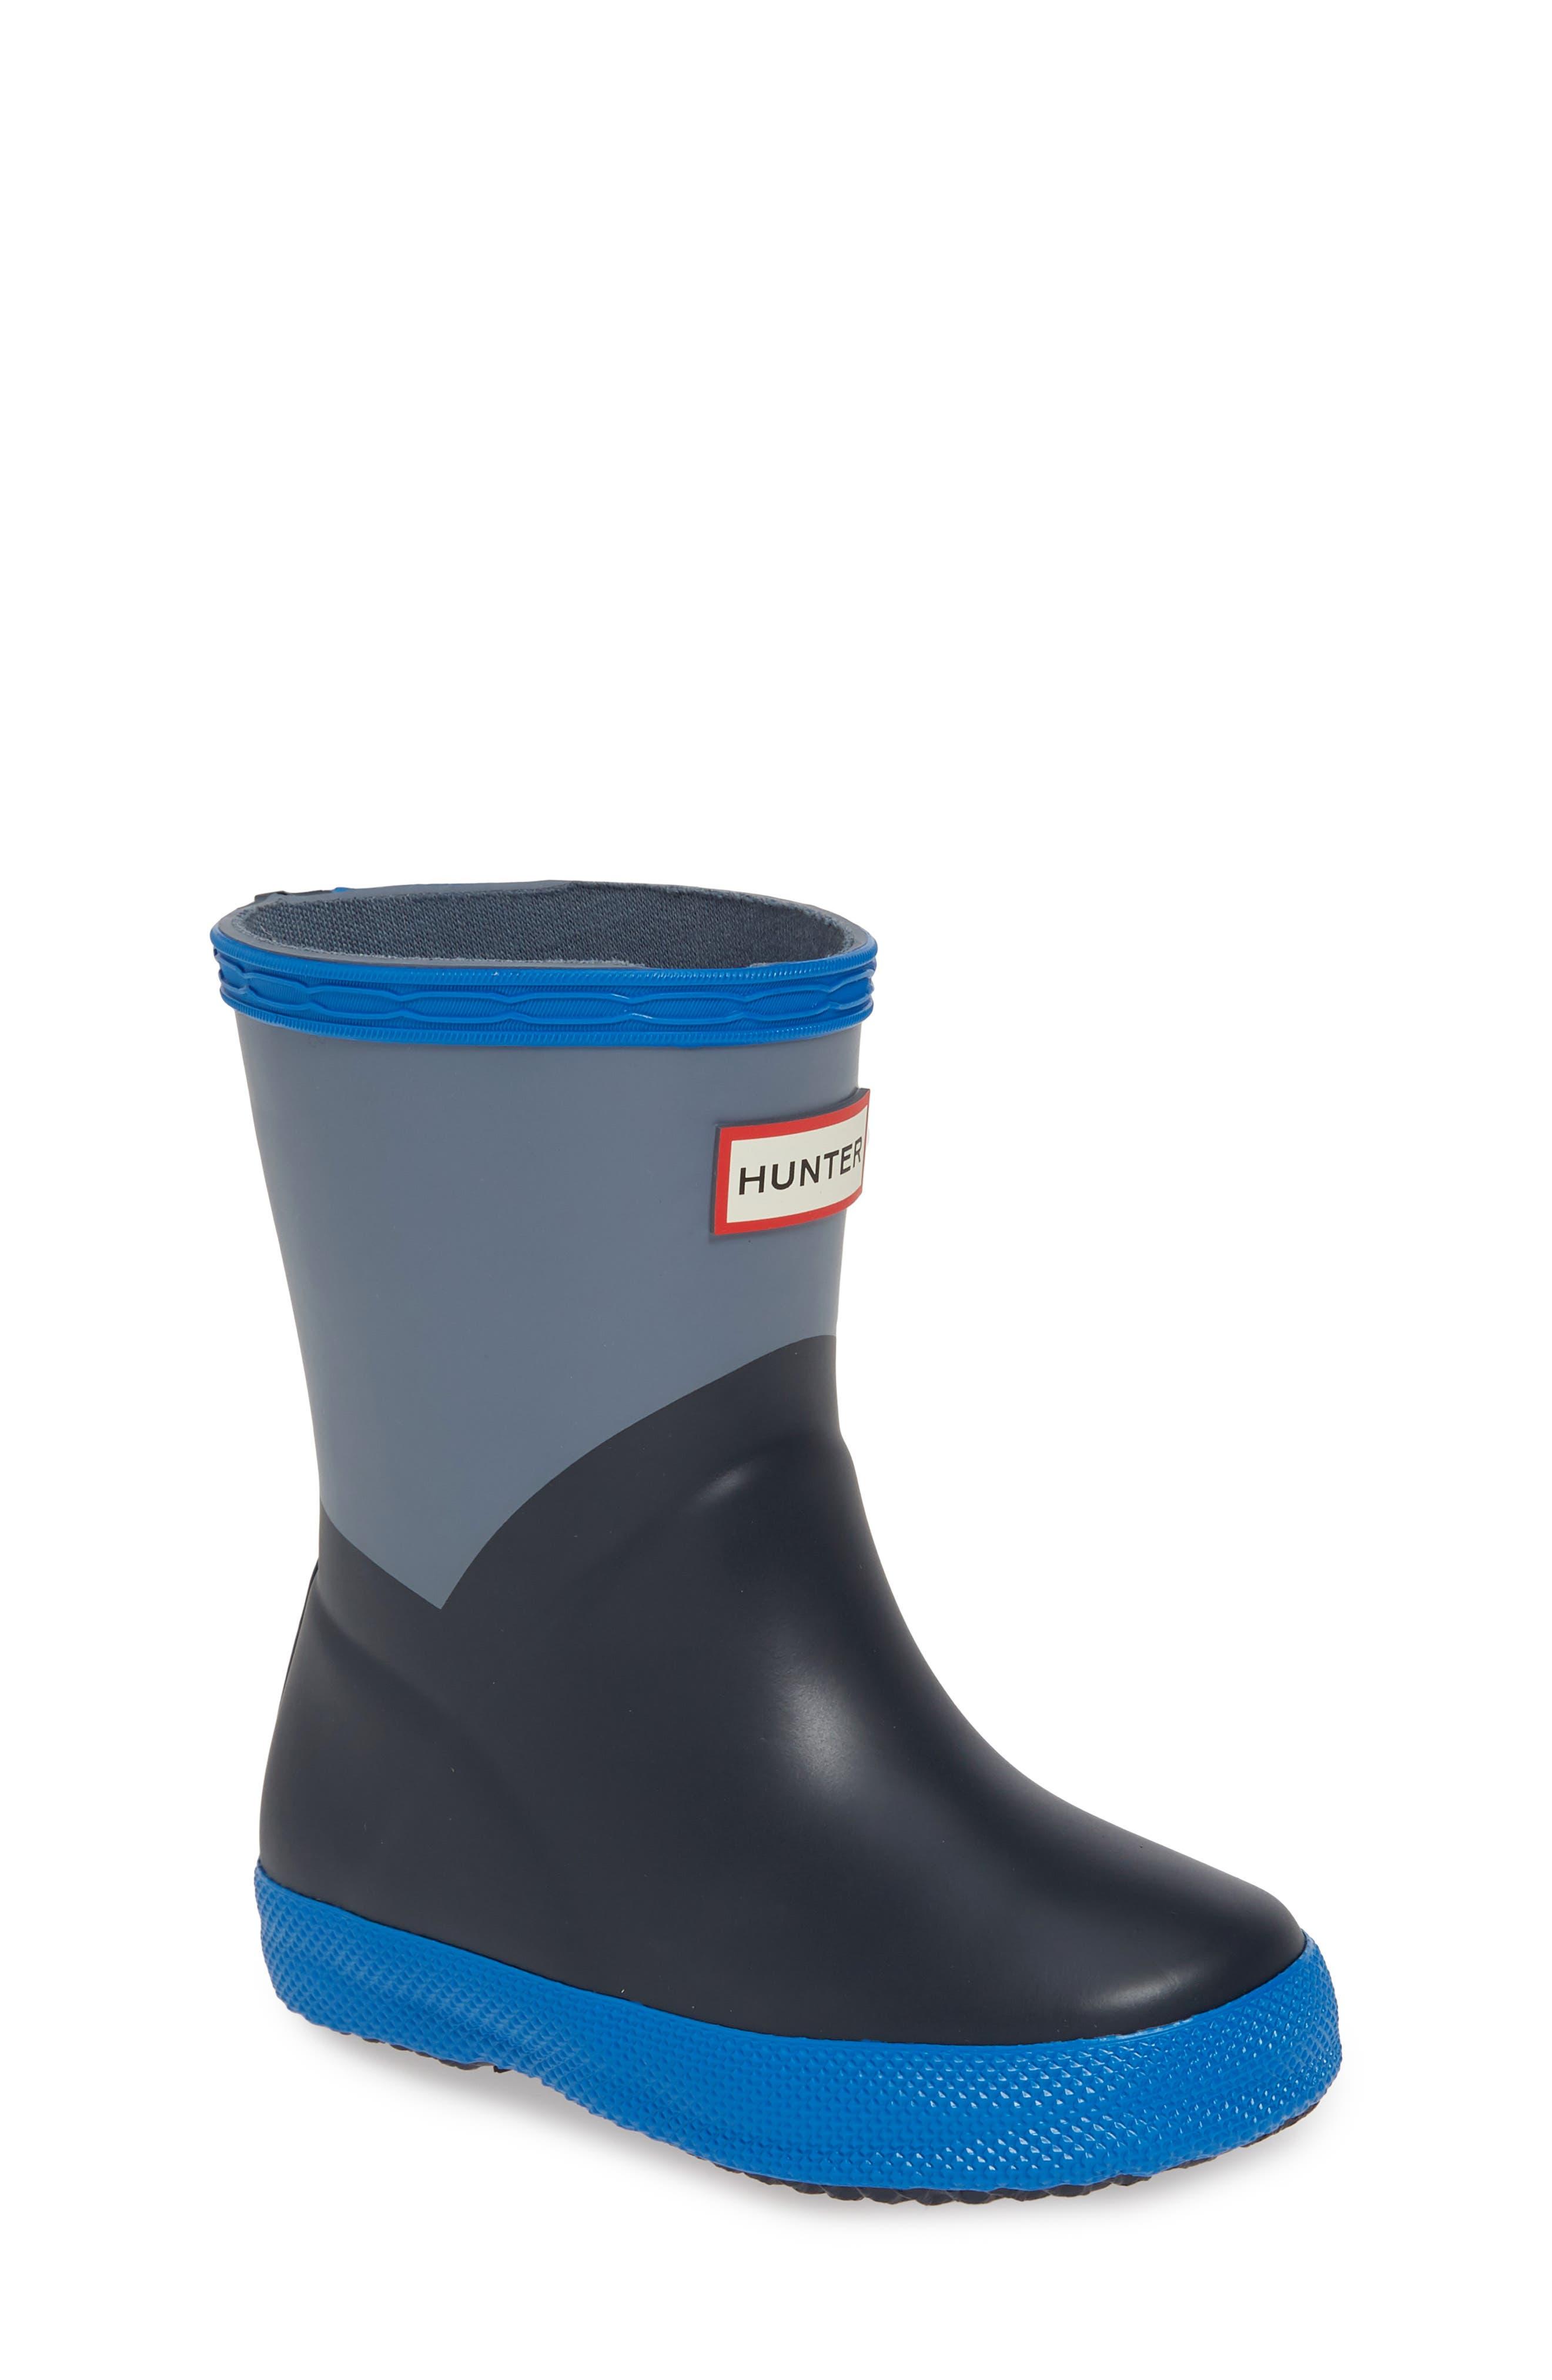 HUNTER First Classic Waterproof Rain Boot, Main, color, GULL GREY/ BUCKET BLUE/ NAVY